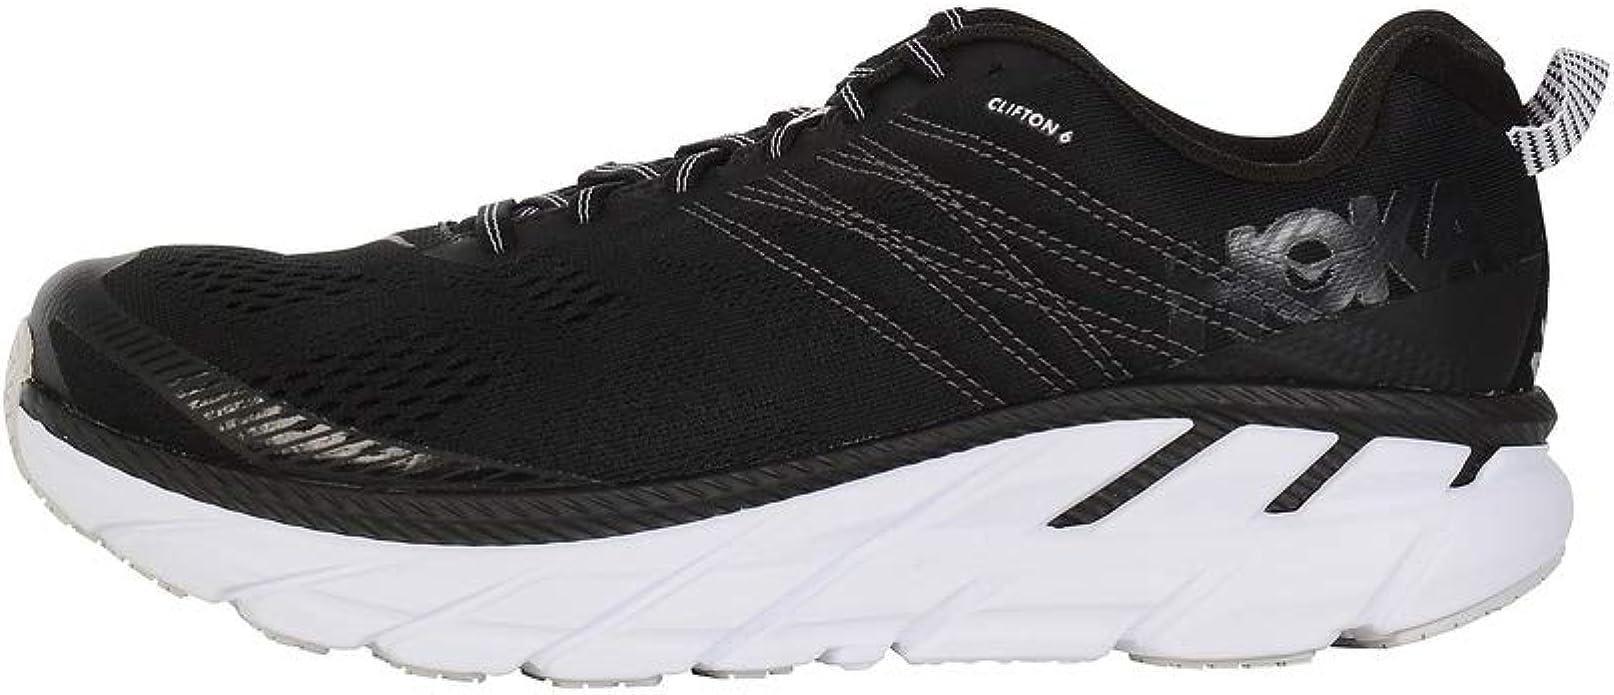 Hoka Clifton 6 Men's Running Shoes